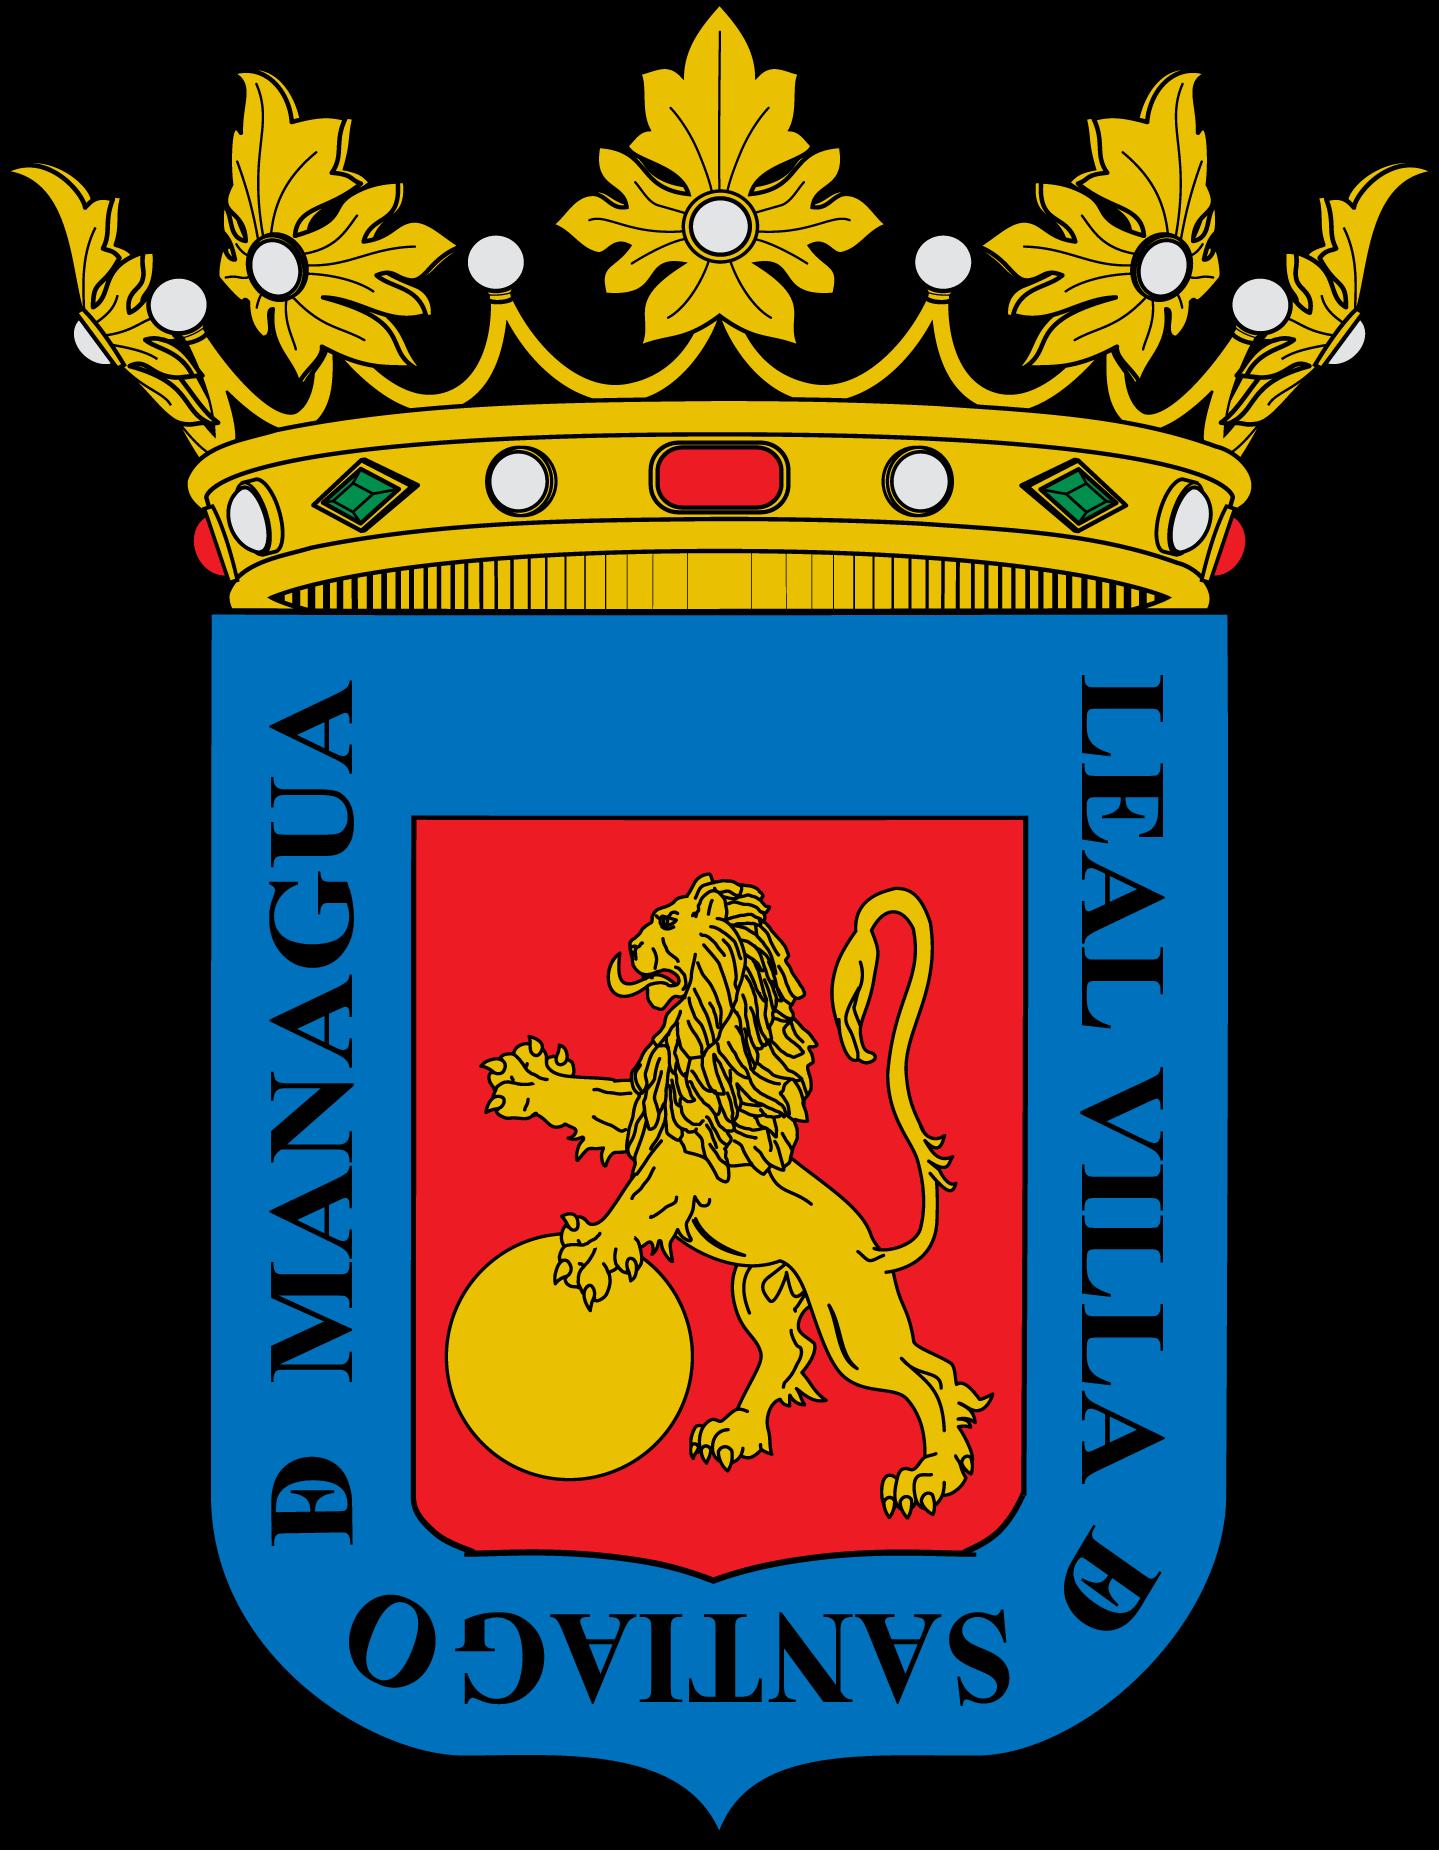 Managua escudo a color